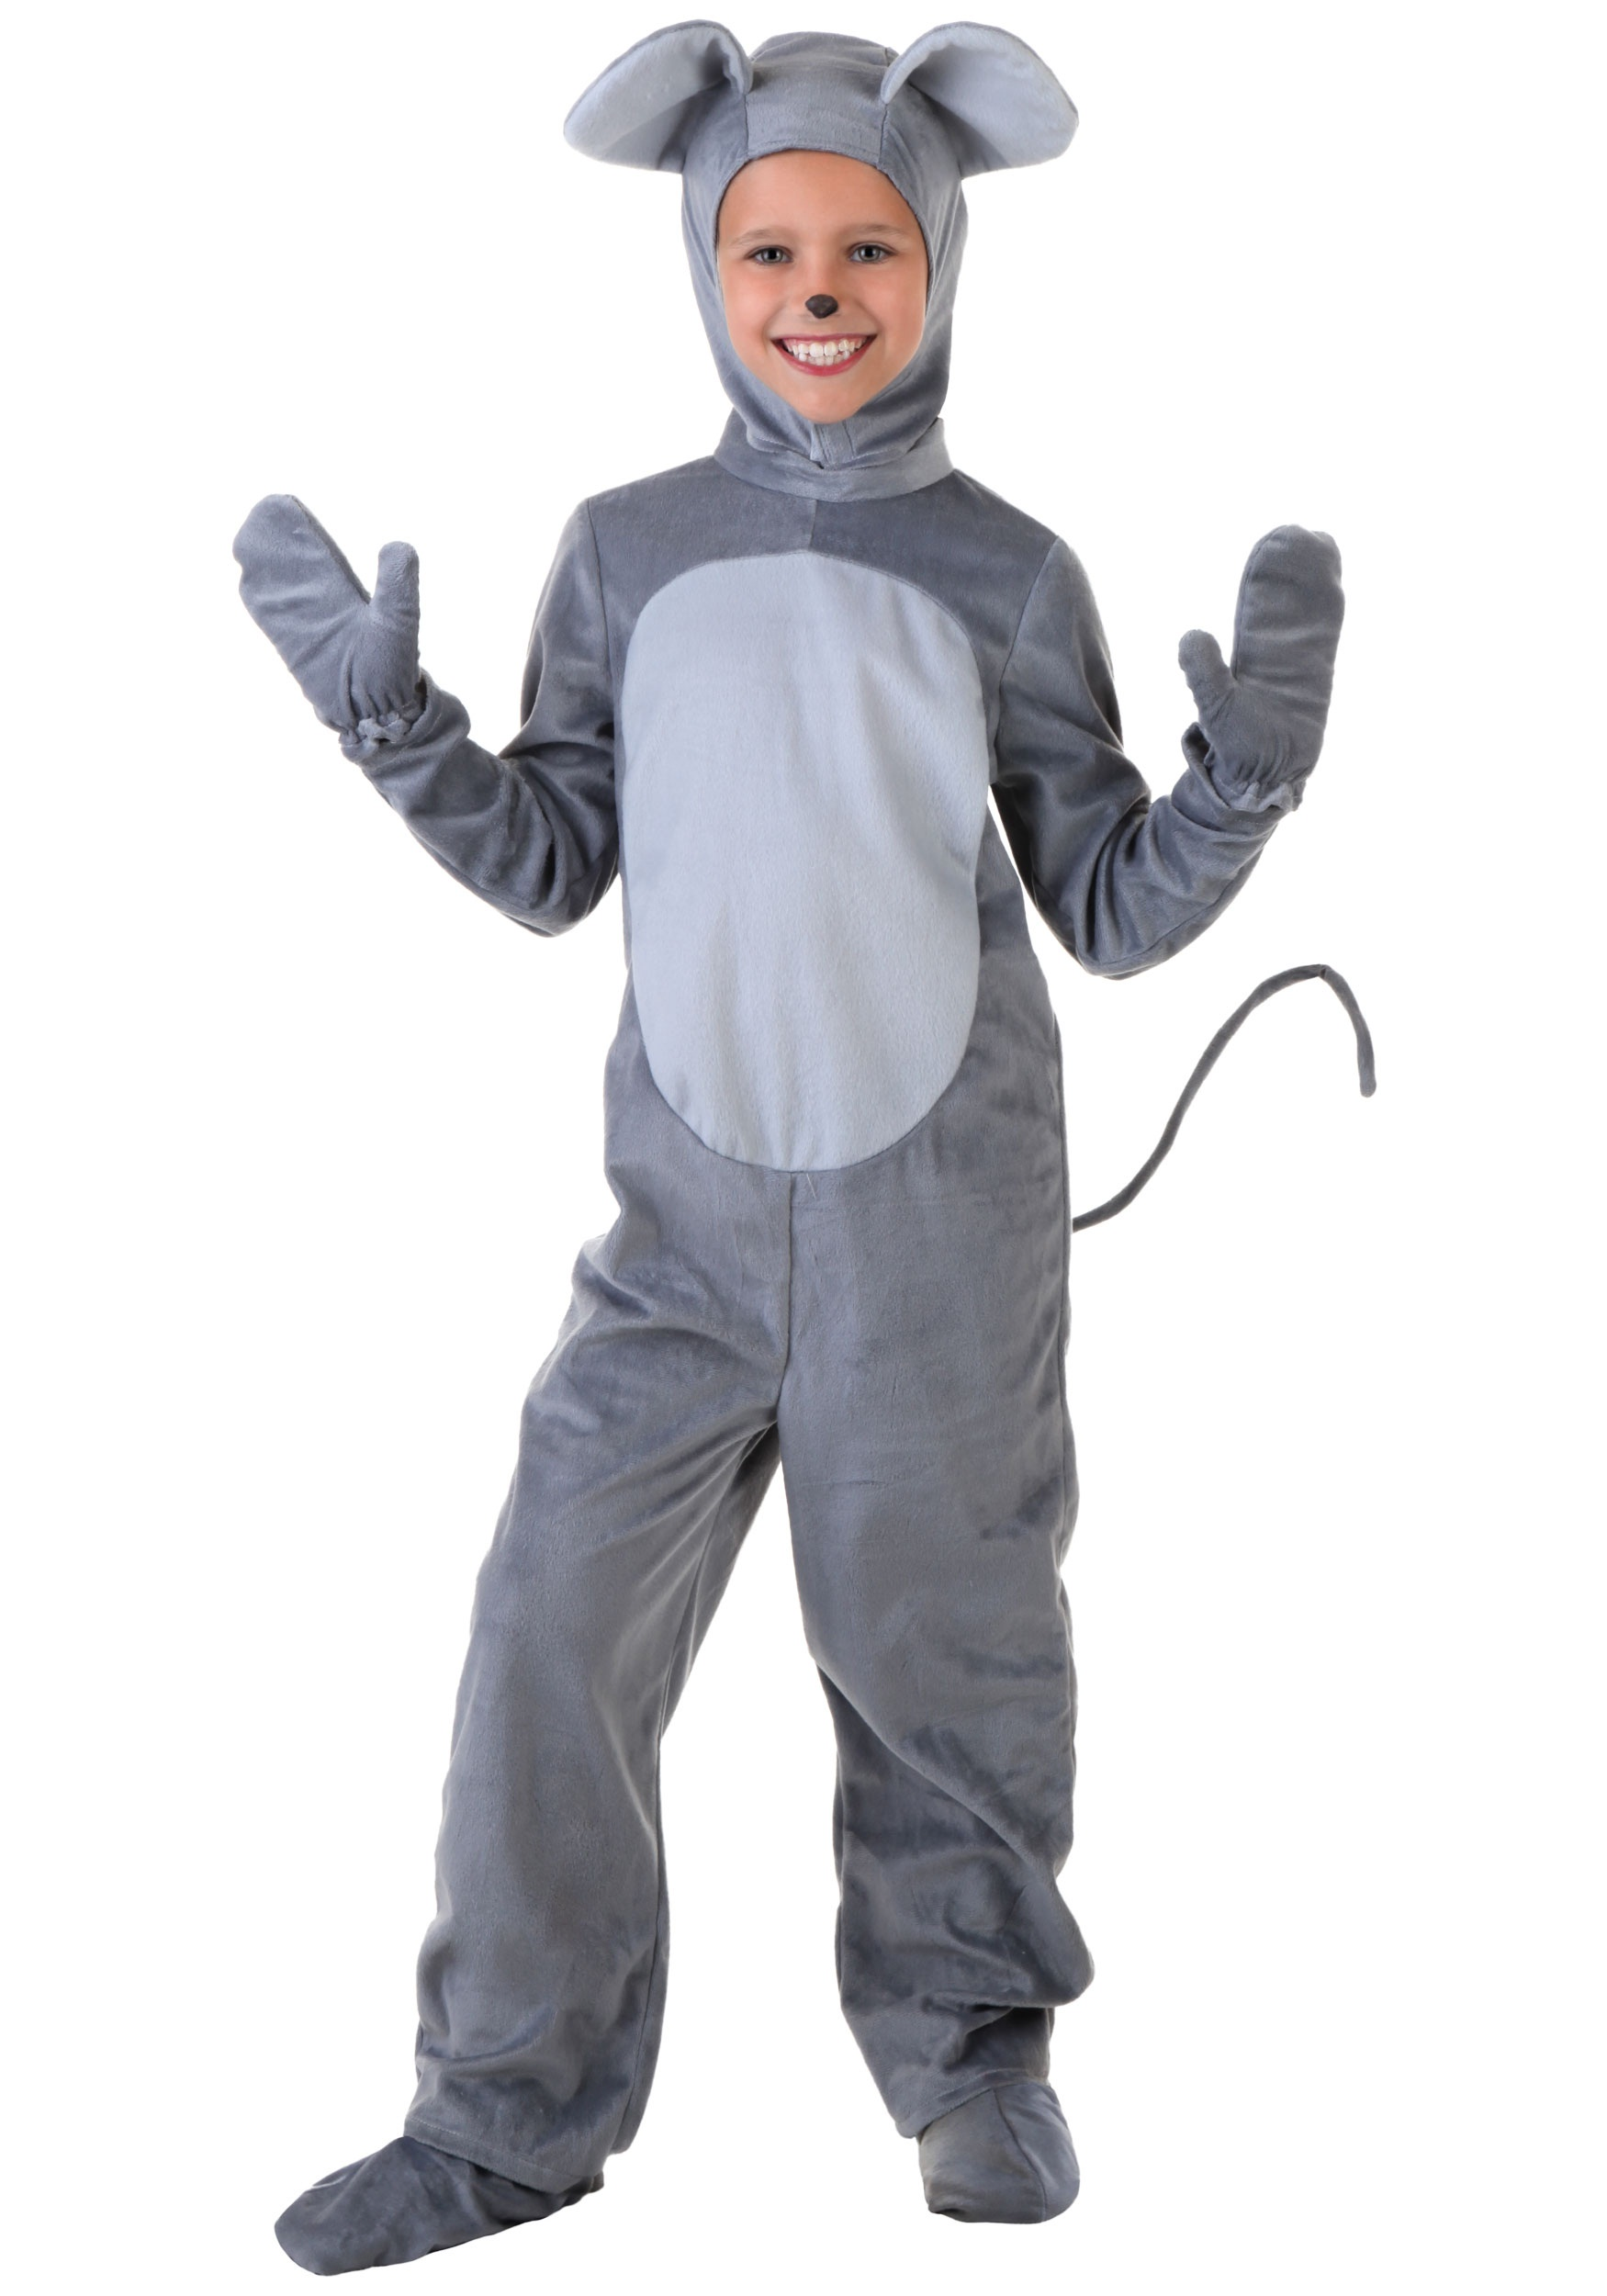 sc 1 st  Walmart & Child Mouse Costume - Walmart.com